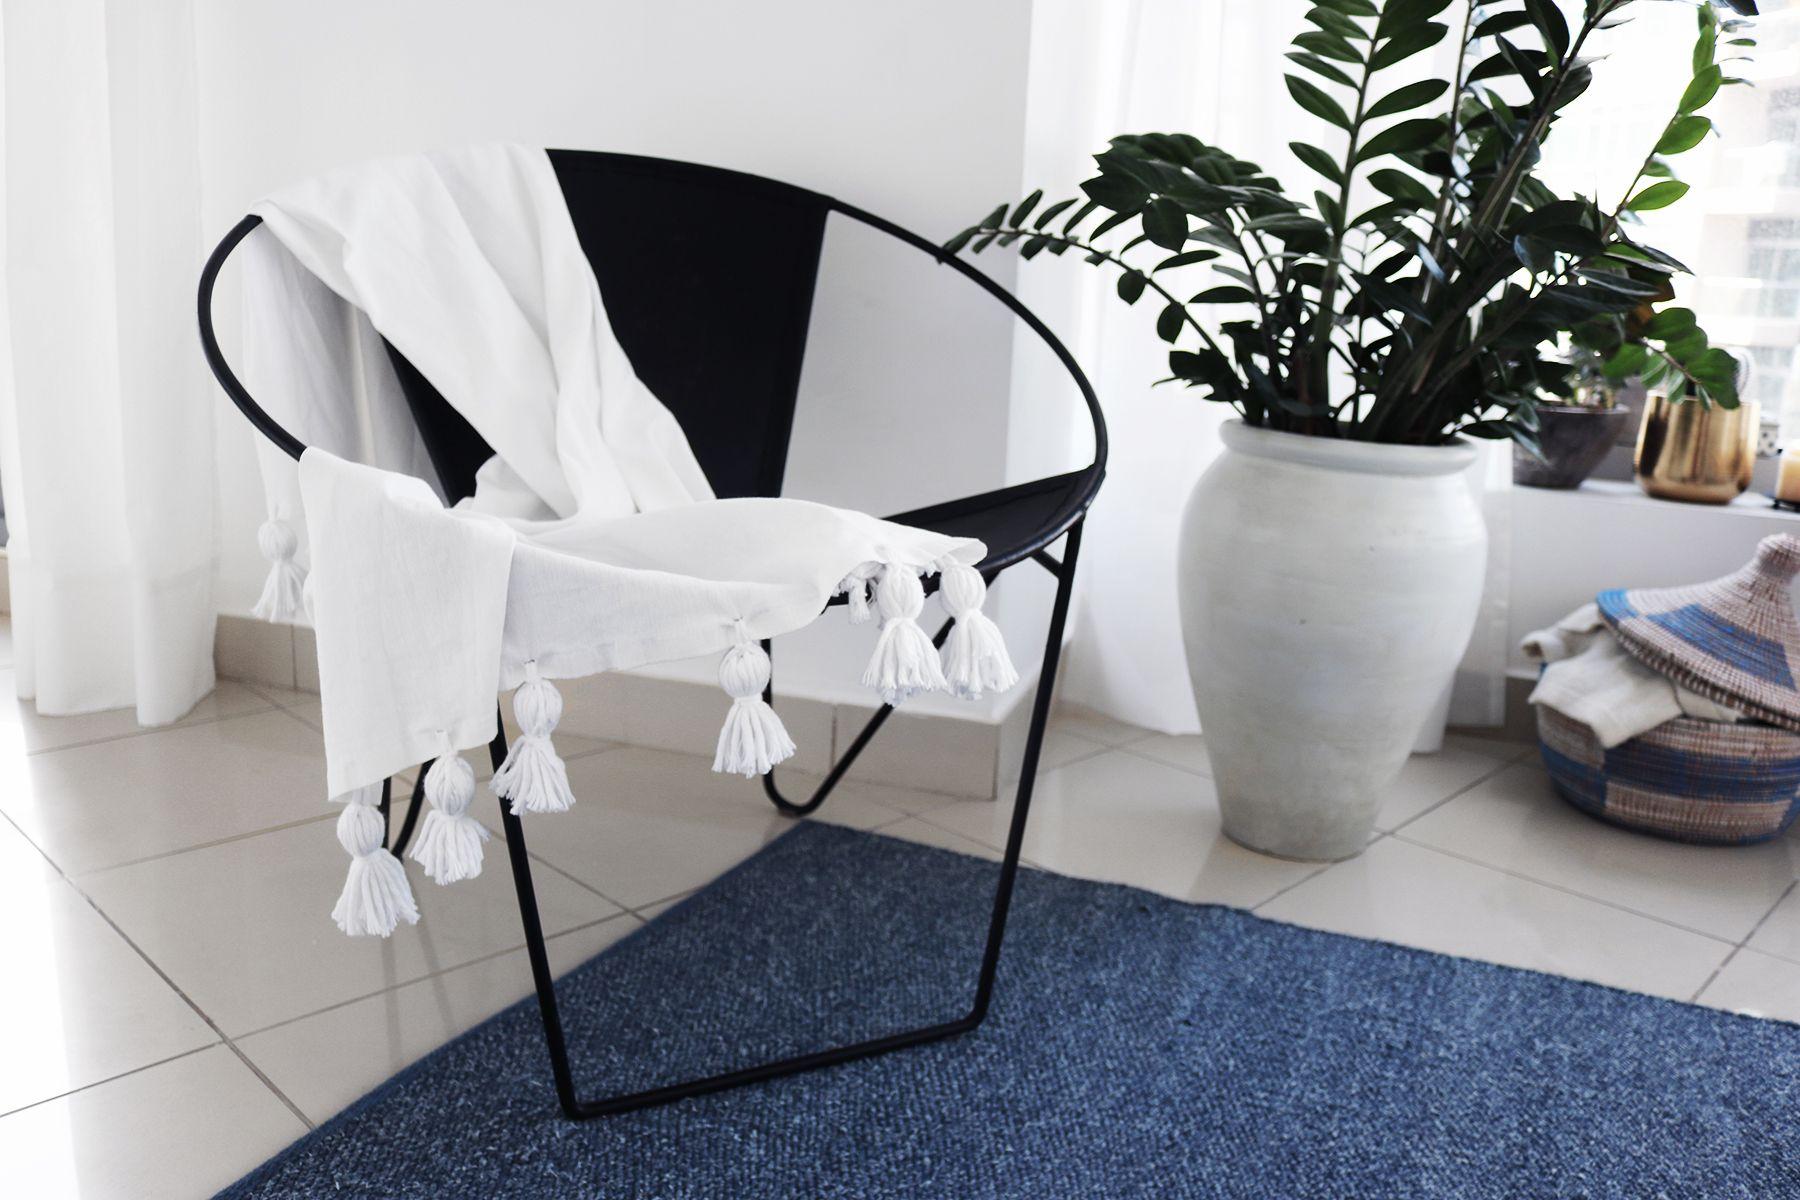 http://kattan.org/contouraffair/homediy/Tassel%20Blanket/DIY_TasselBlanket.jpg